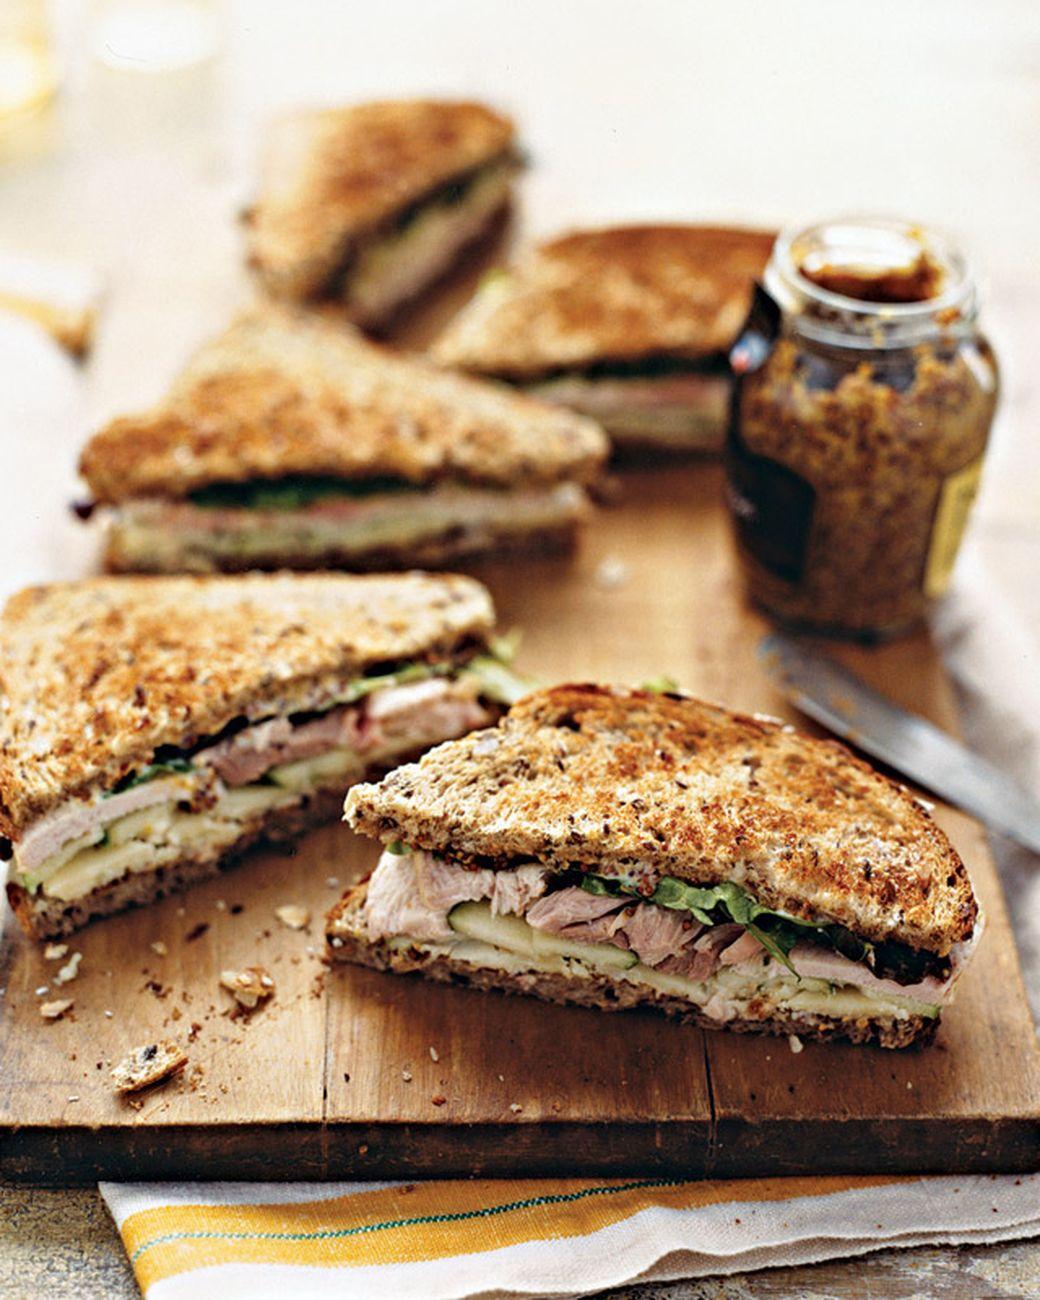 a3a902d1e59d2431bf136a62aa467173 - Sandwiches Ricette